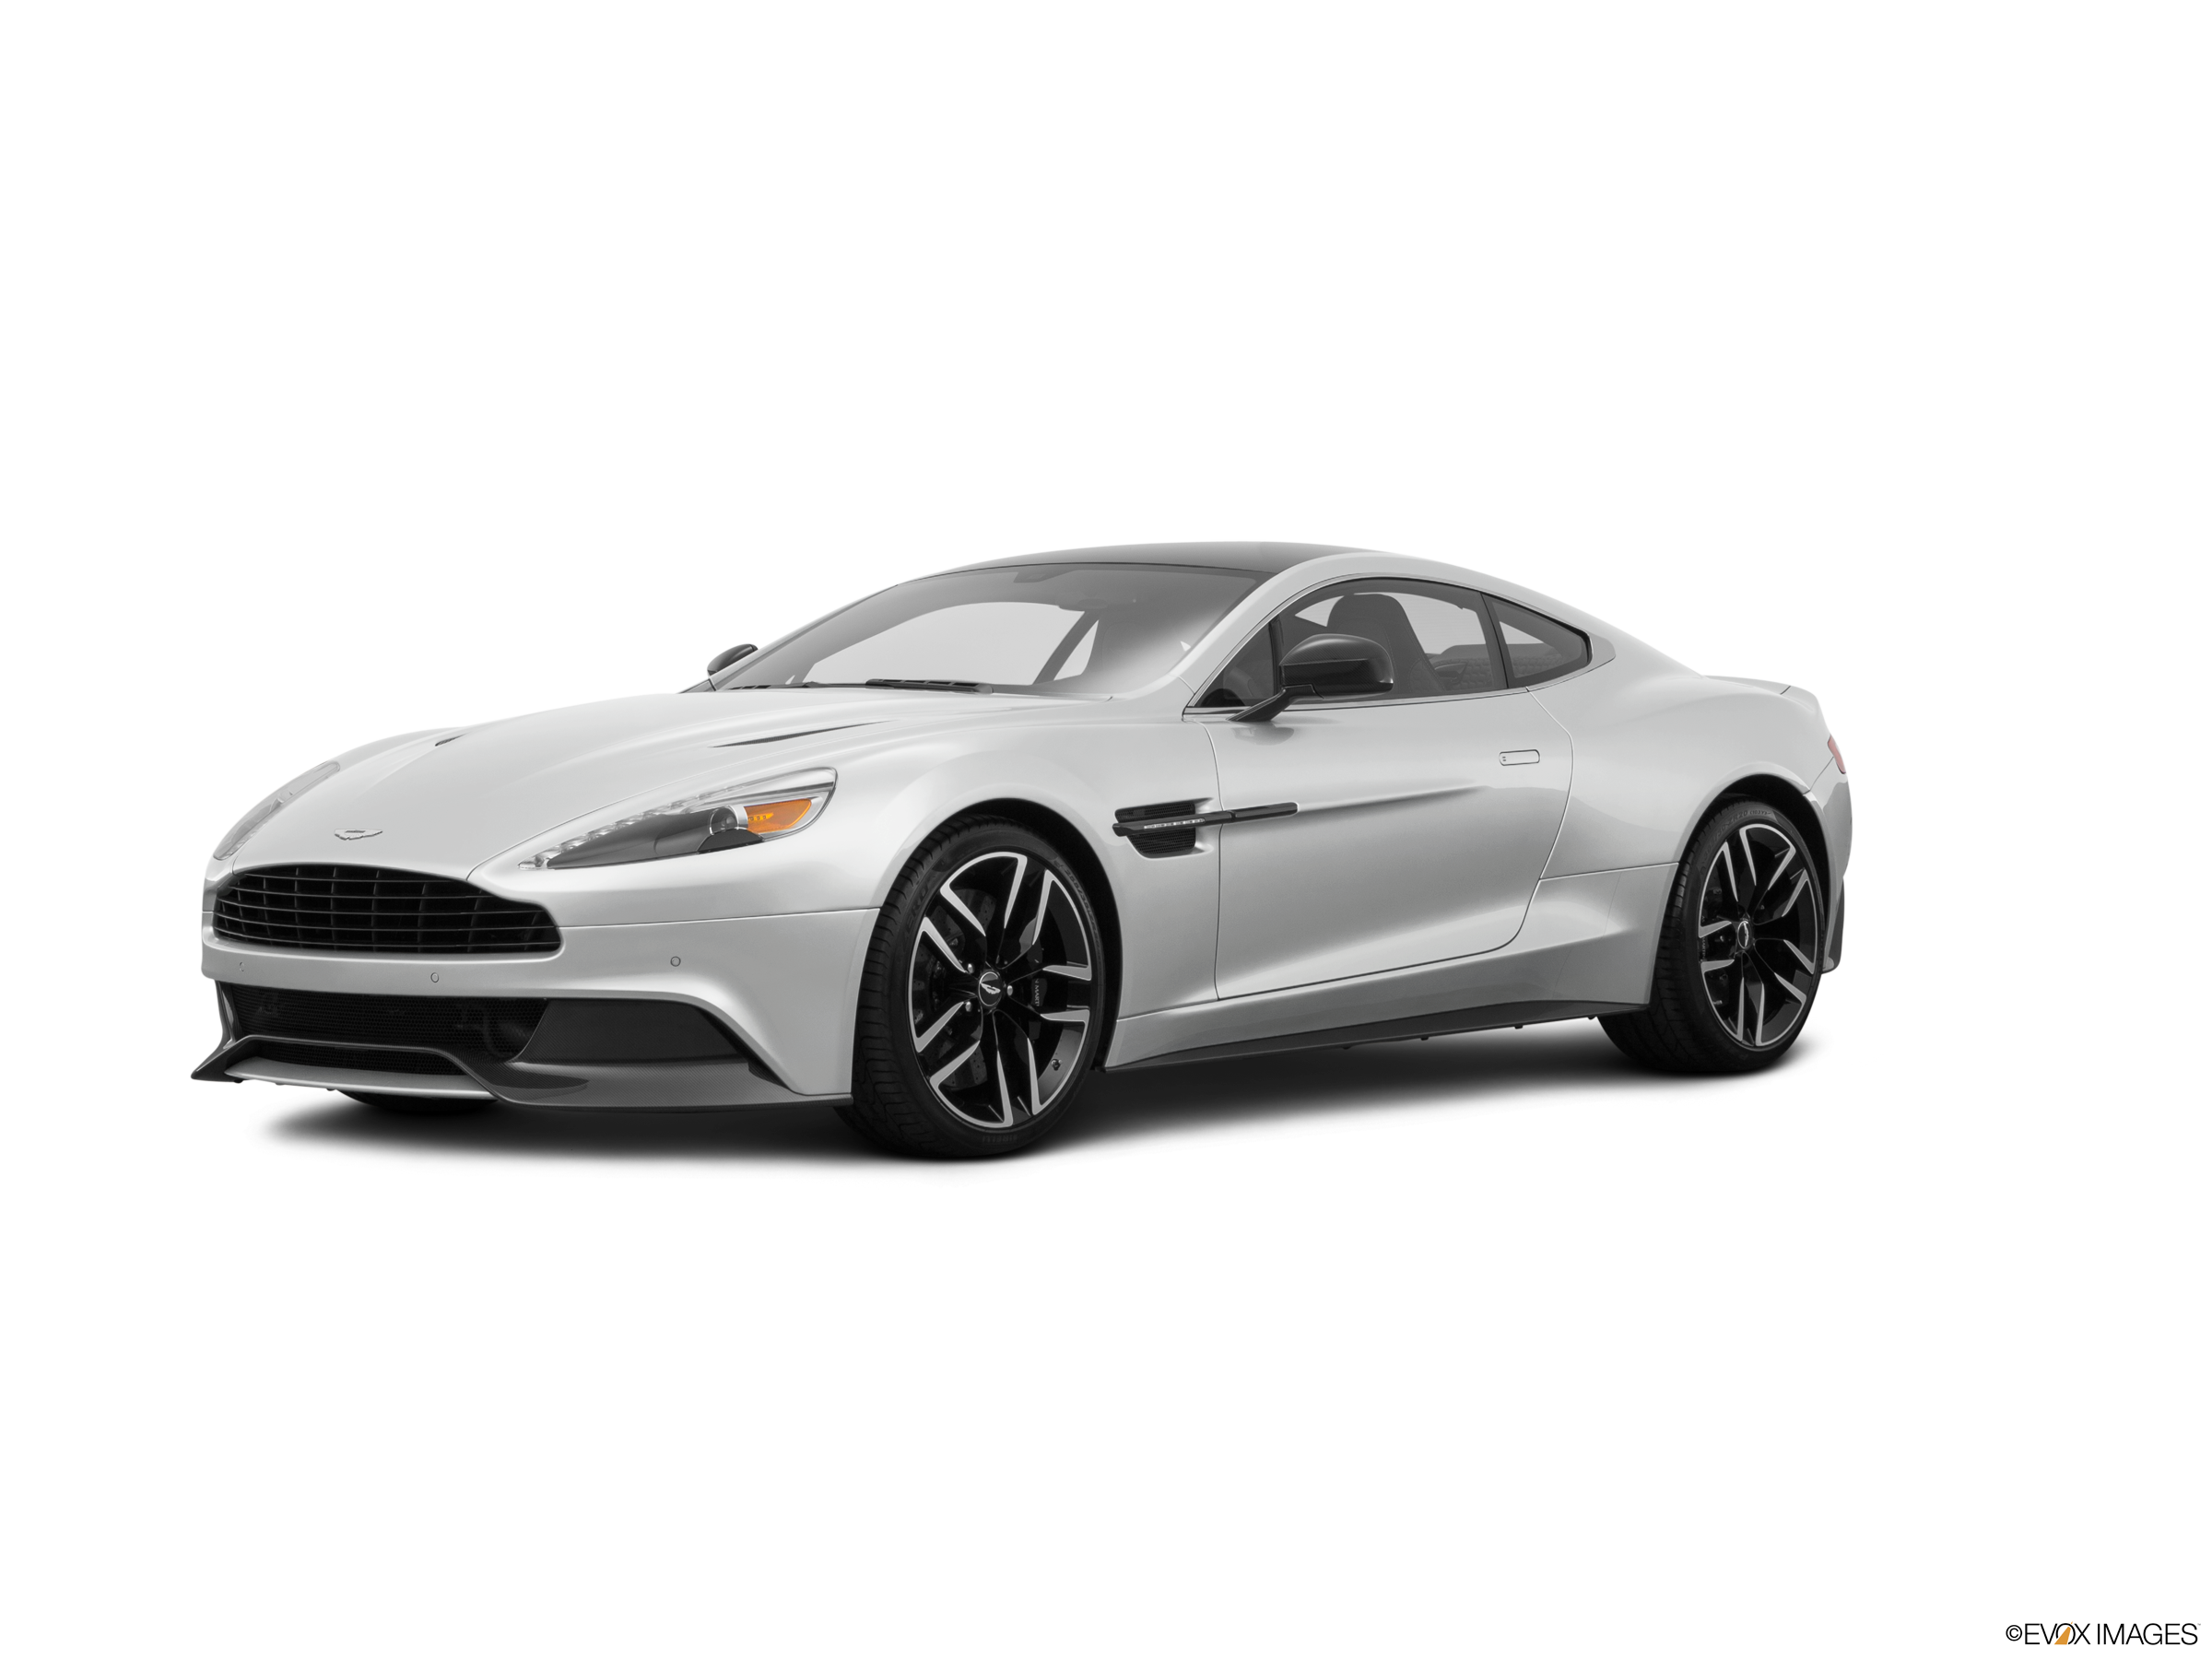 2016 Aston Martin Vanquish Values Cars For Sale Kelley Blue Book